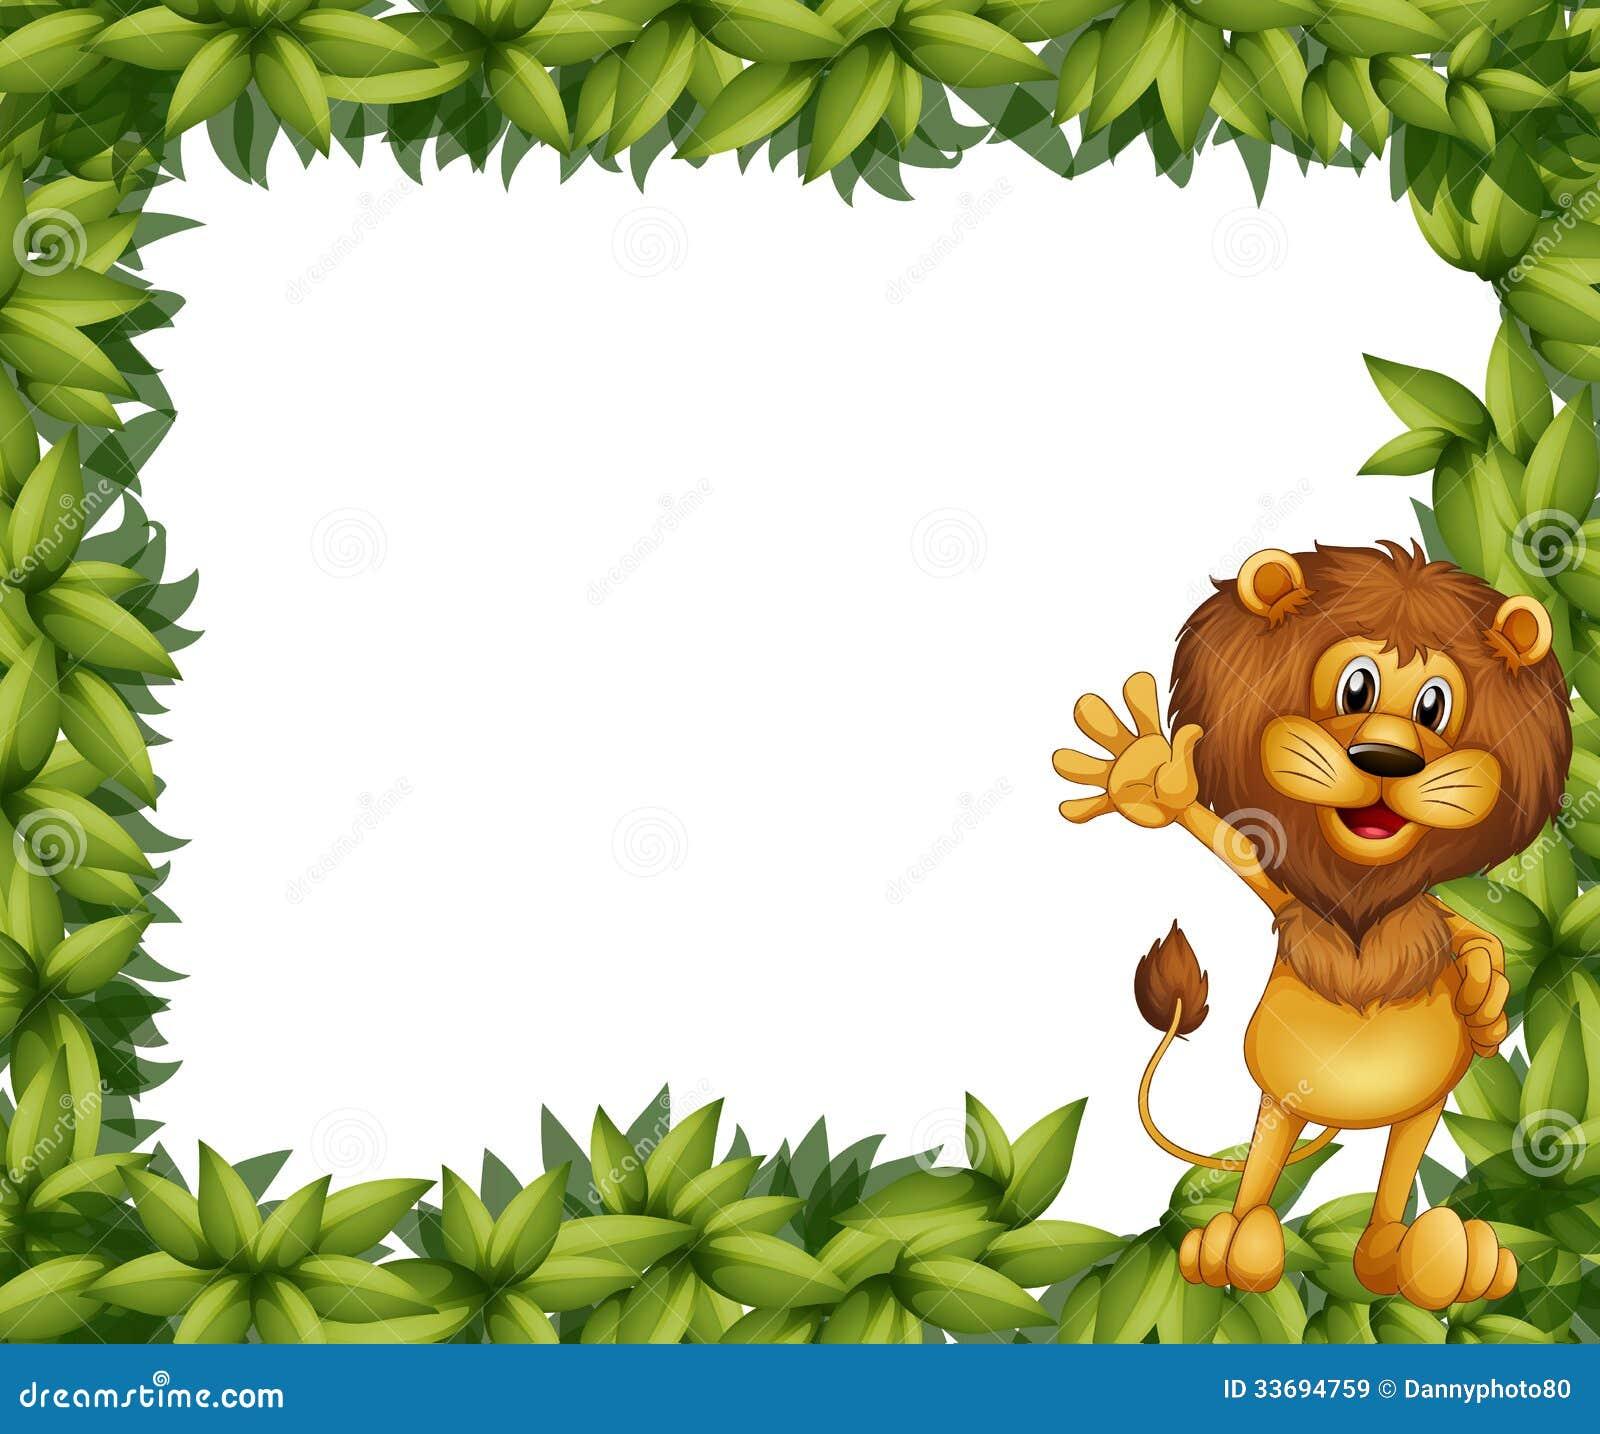 lion and lamb royalty free stock image image 14395206